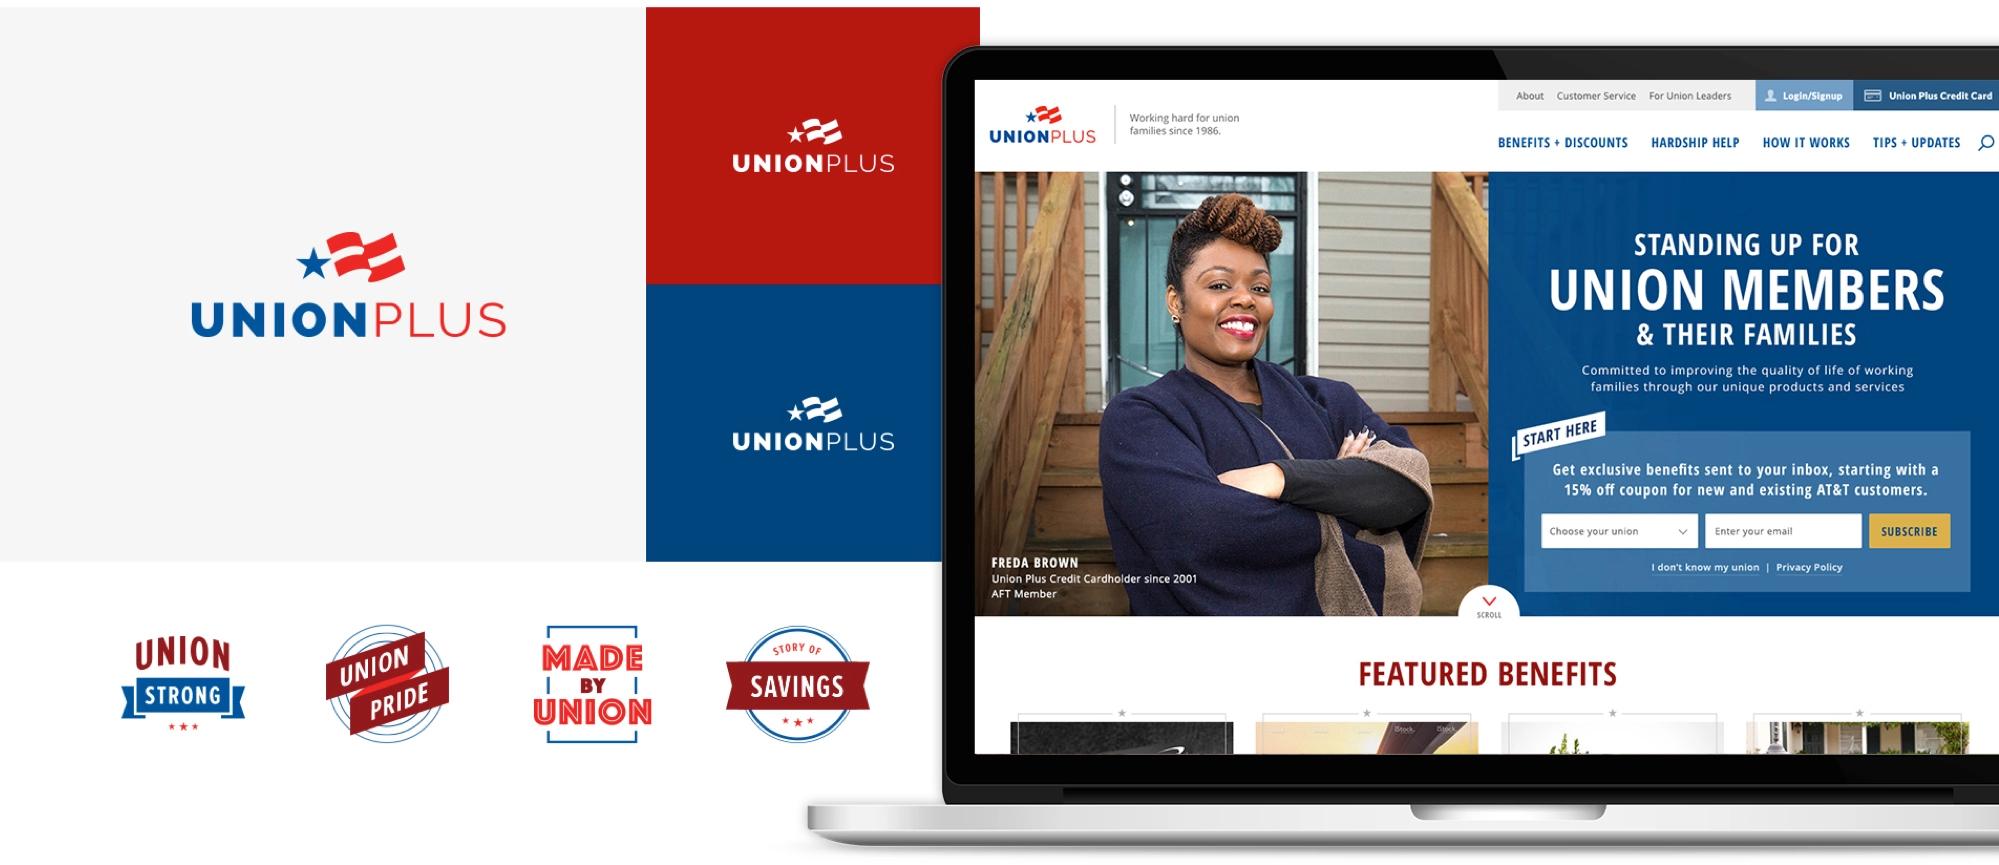 Union Plus Image 1